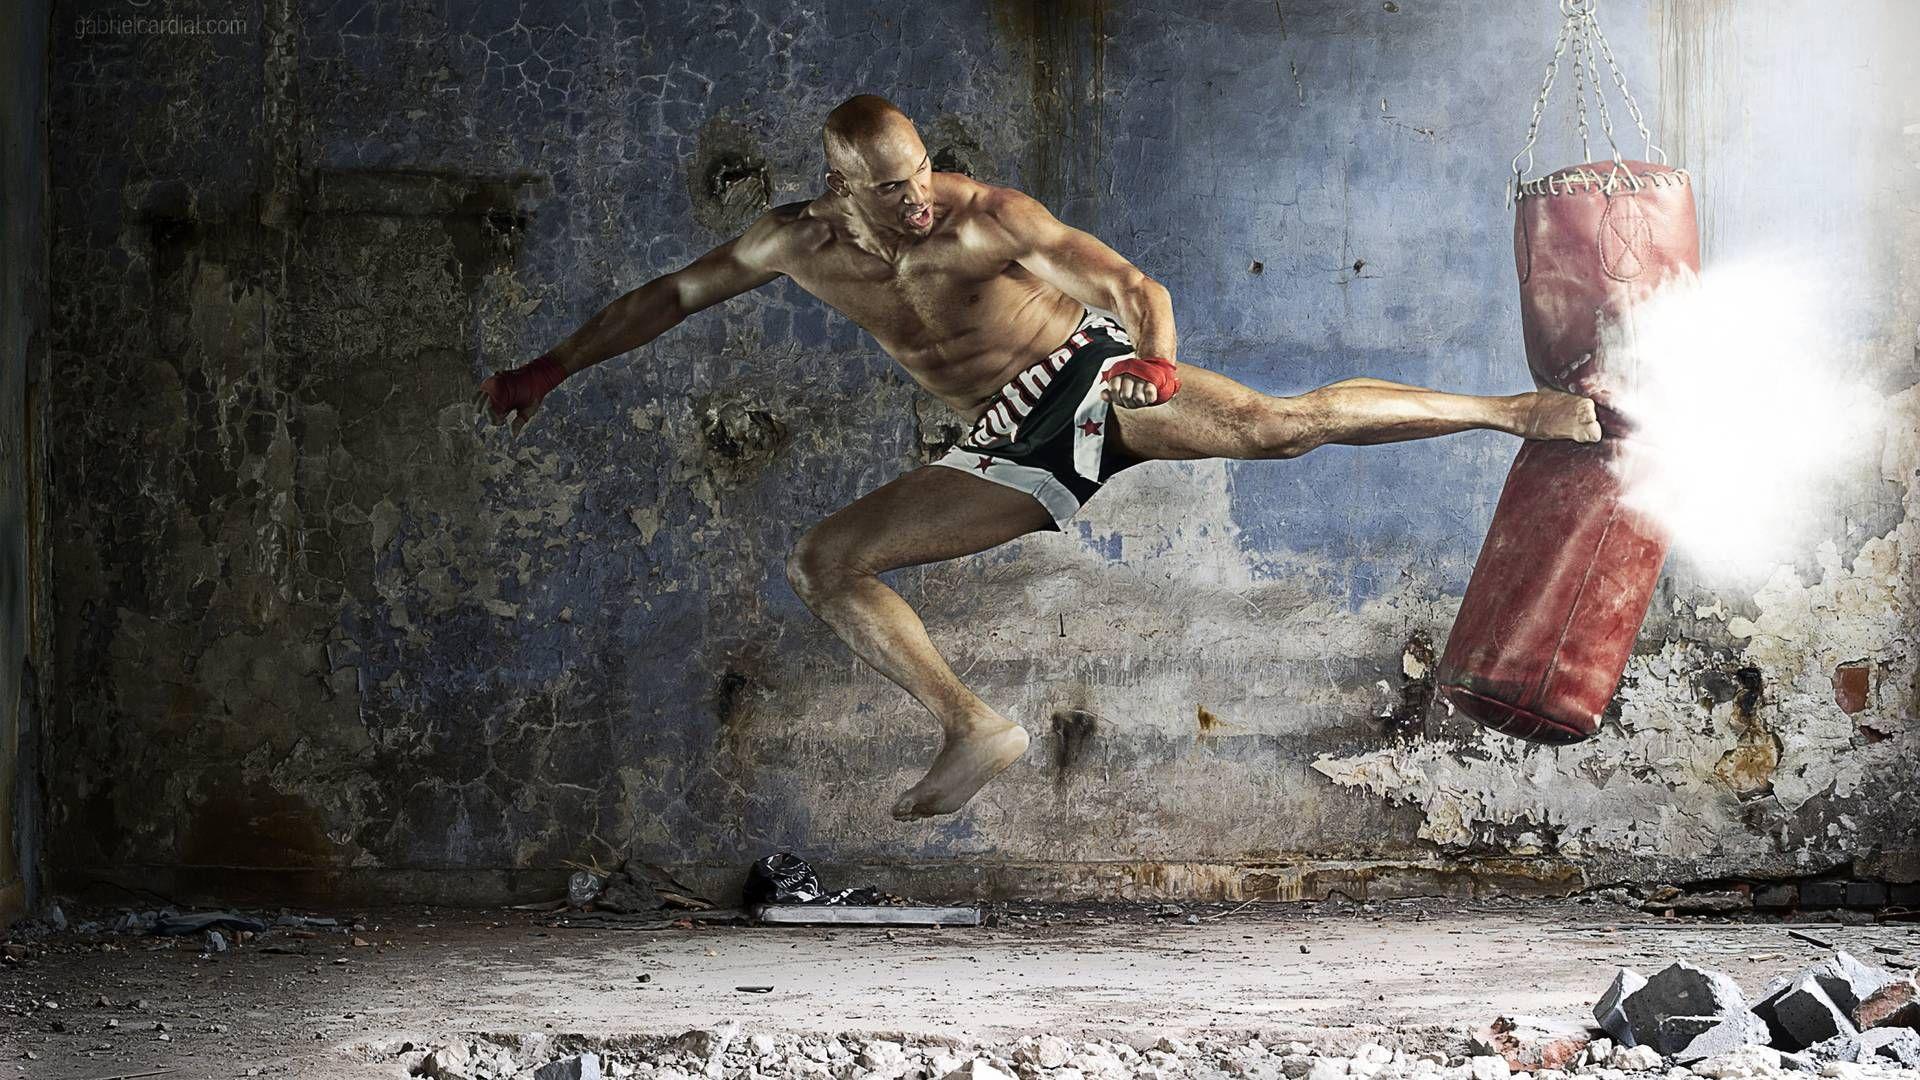 Boxing hd wallpaper download